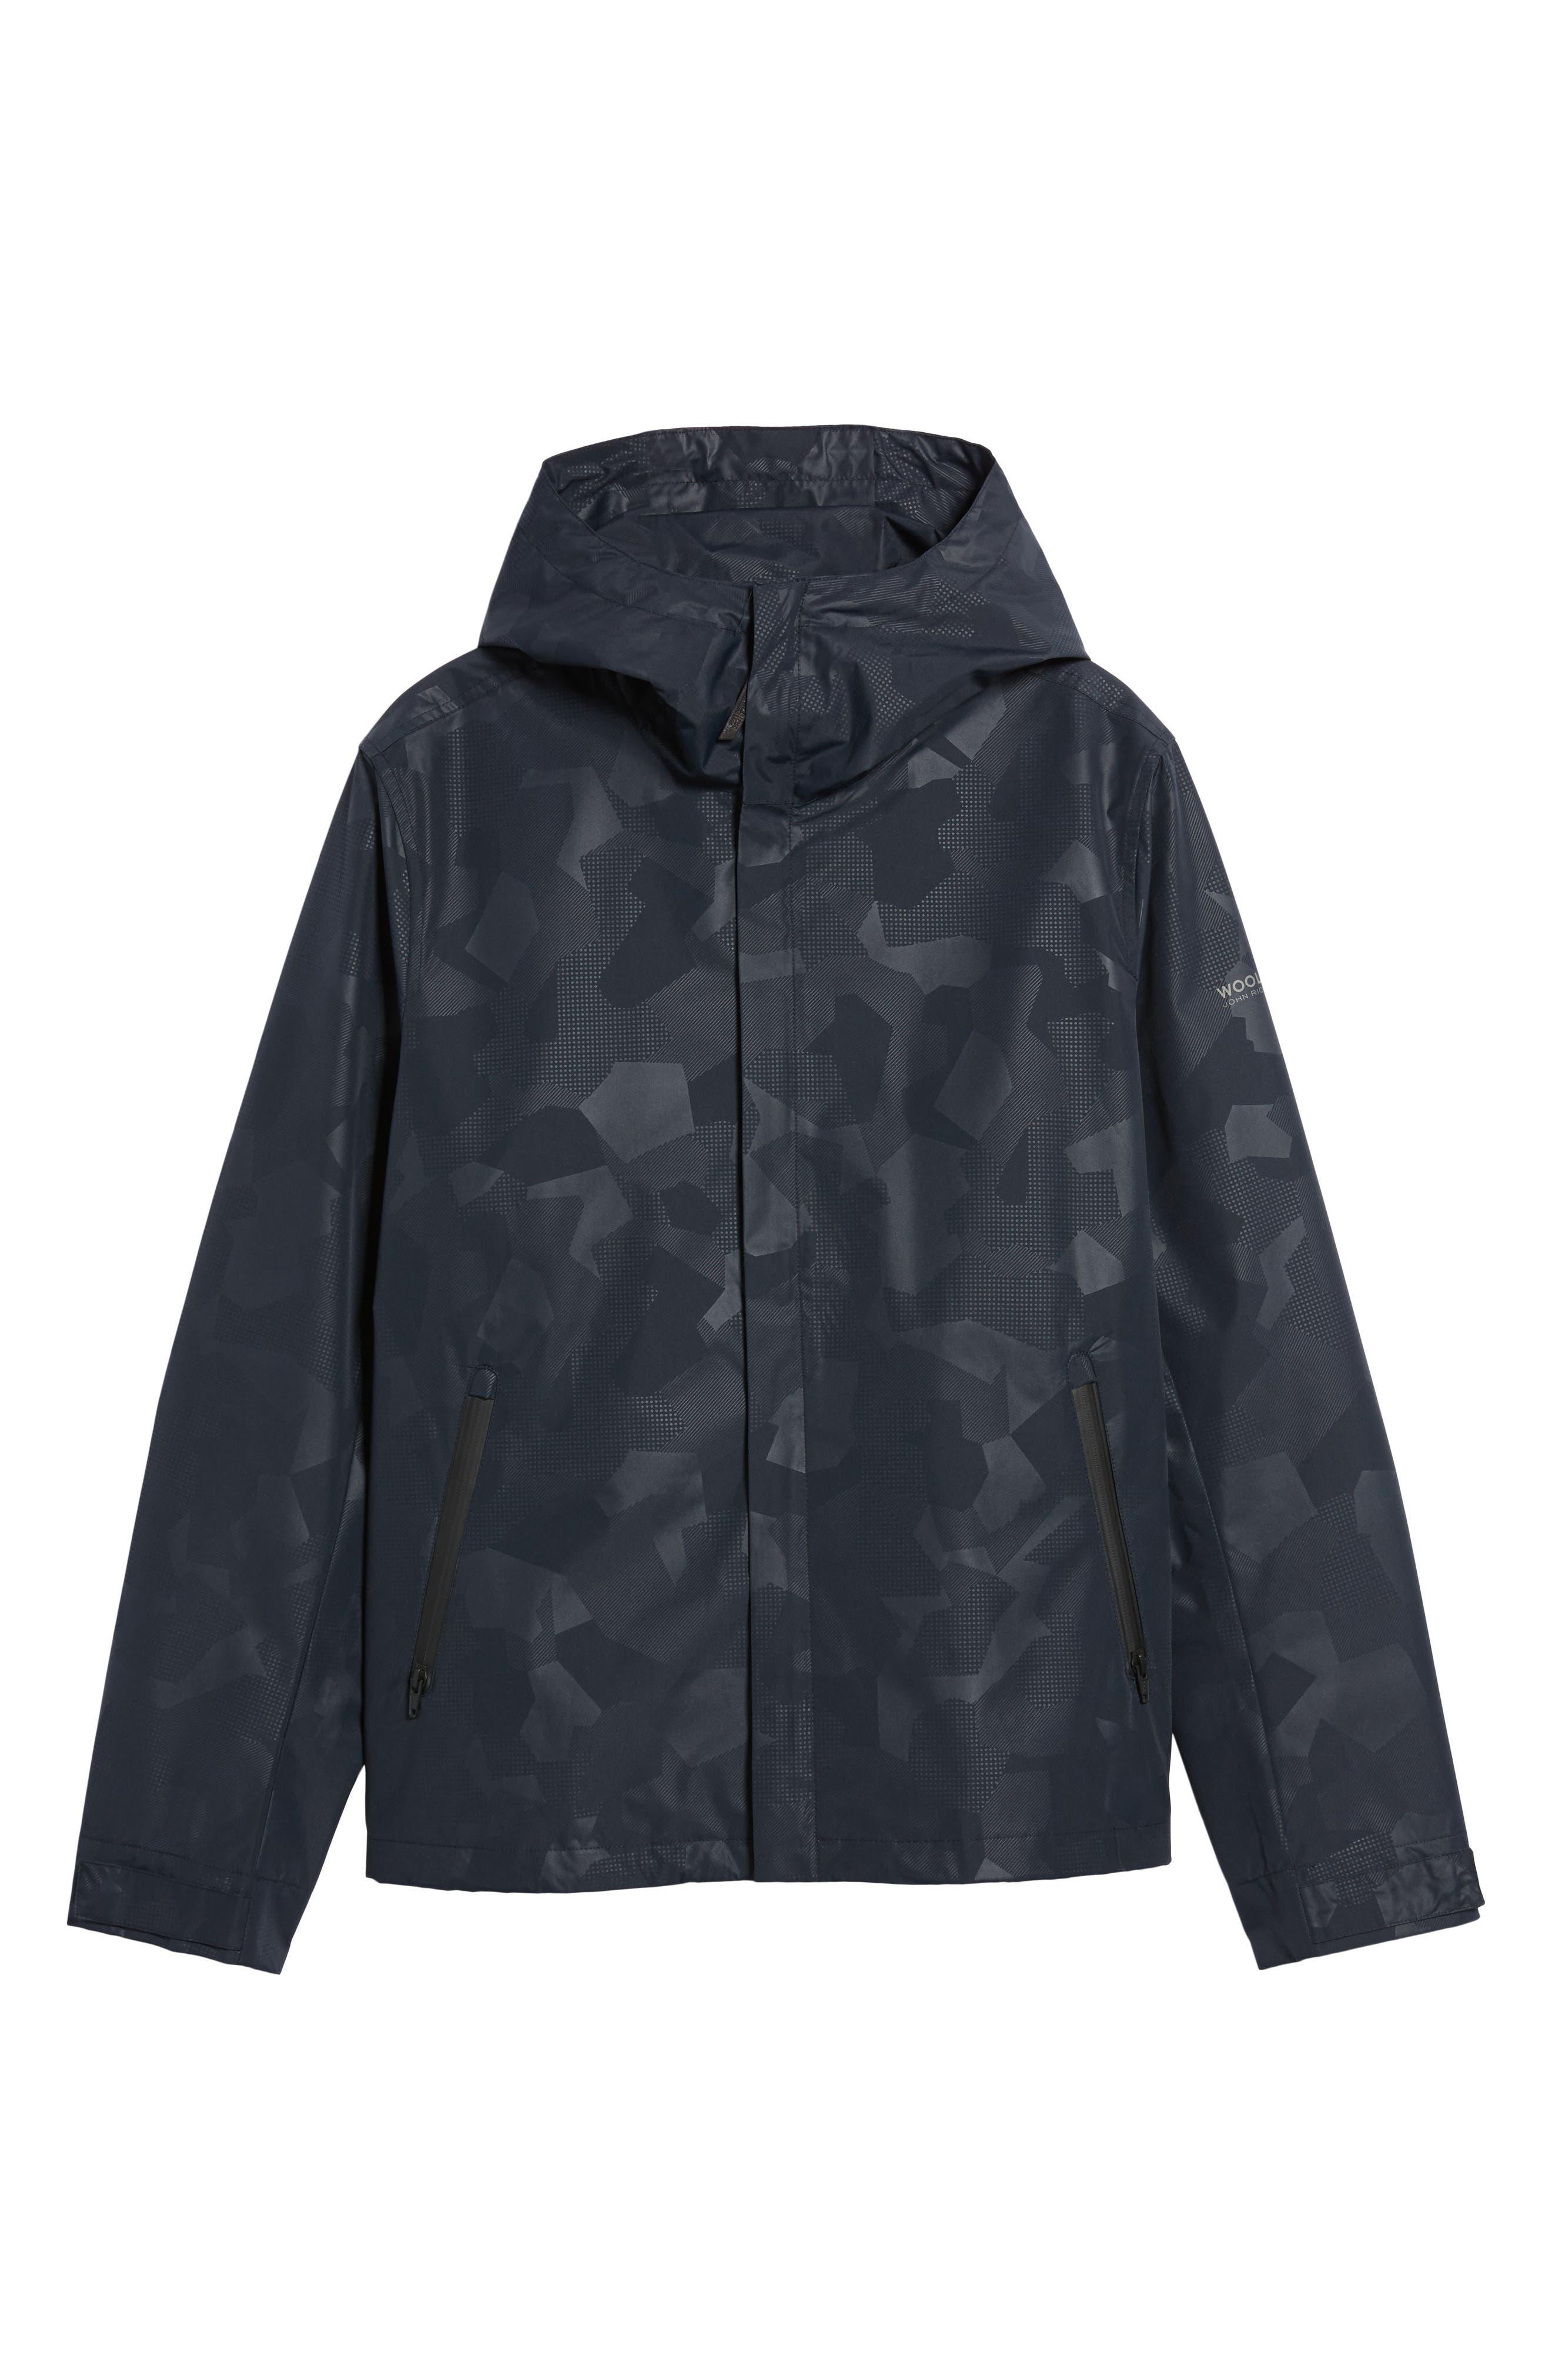 John Rich & Bros. Atlantic Camo Hooded Jacket,                             Alternate thumbnail 14, color,